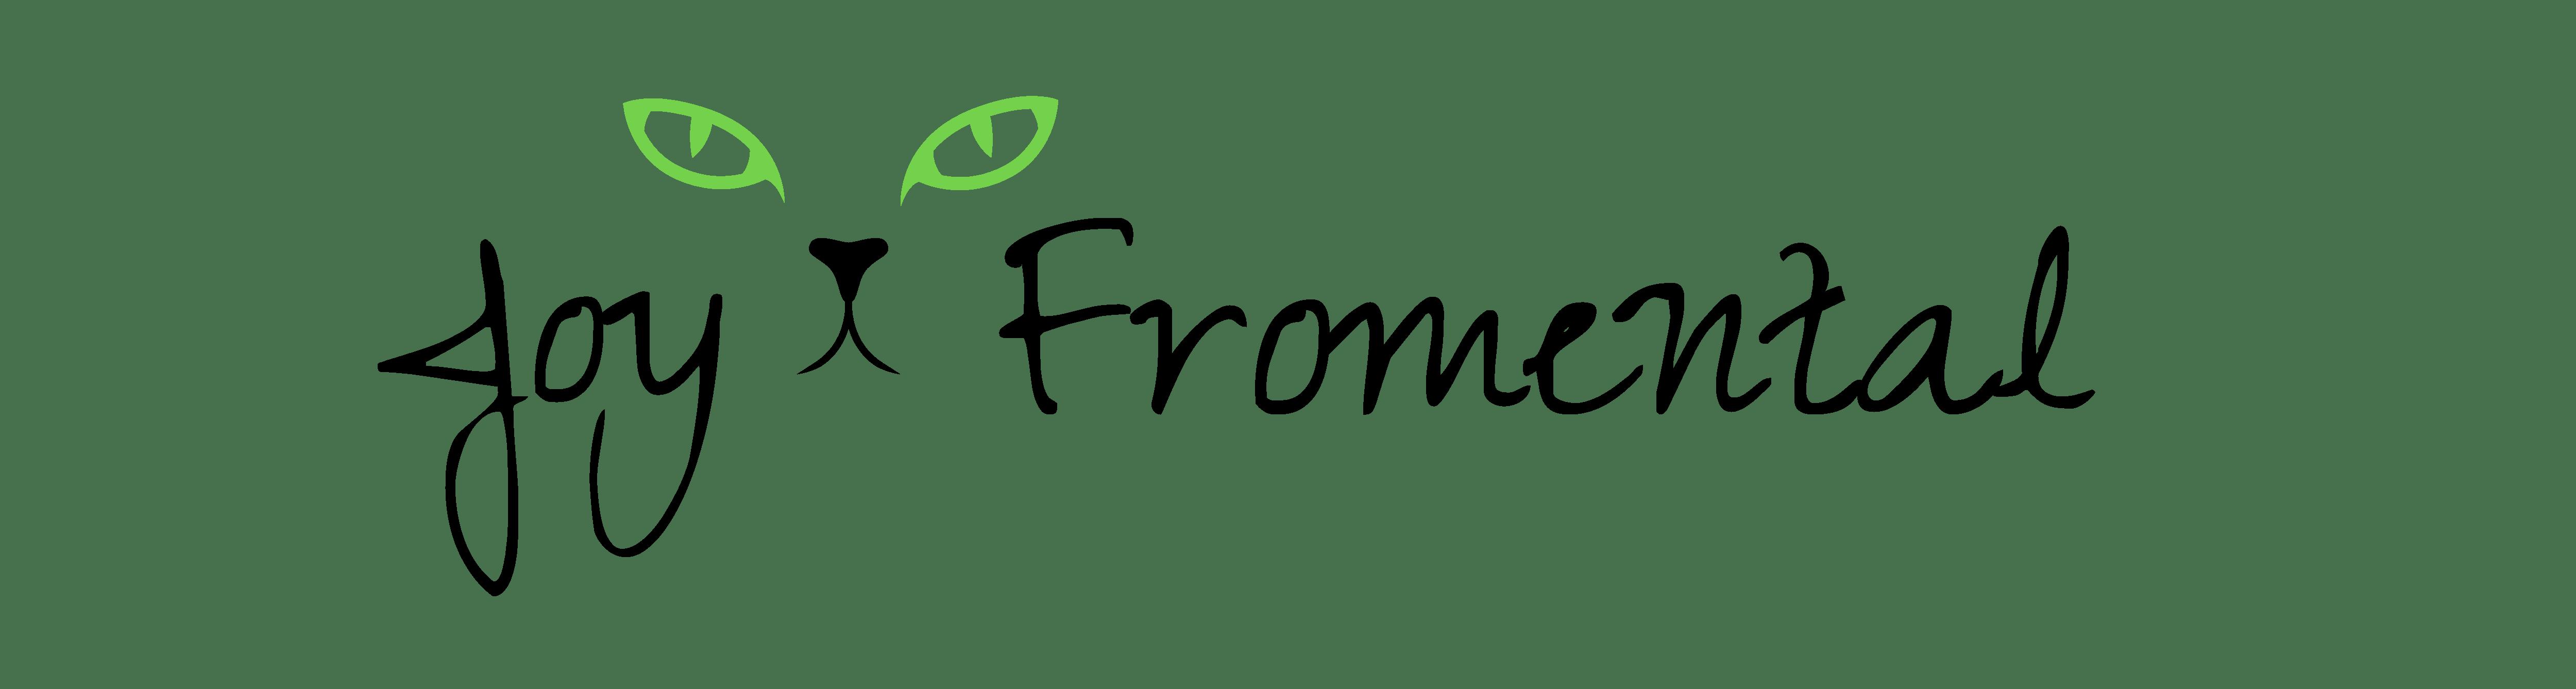 Communication Animale - Joy Fromental